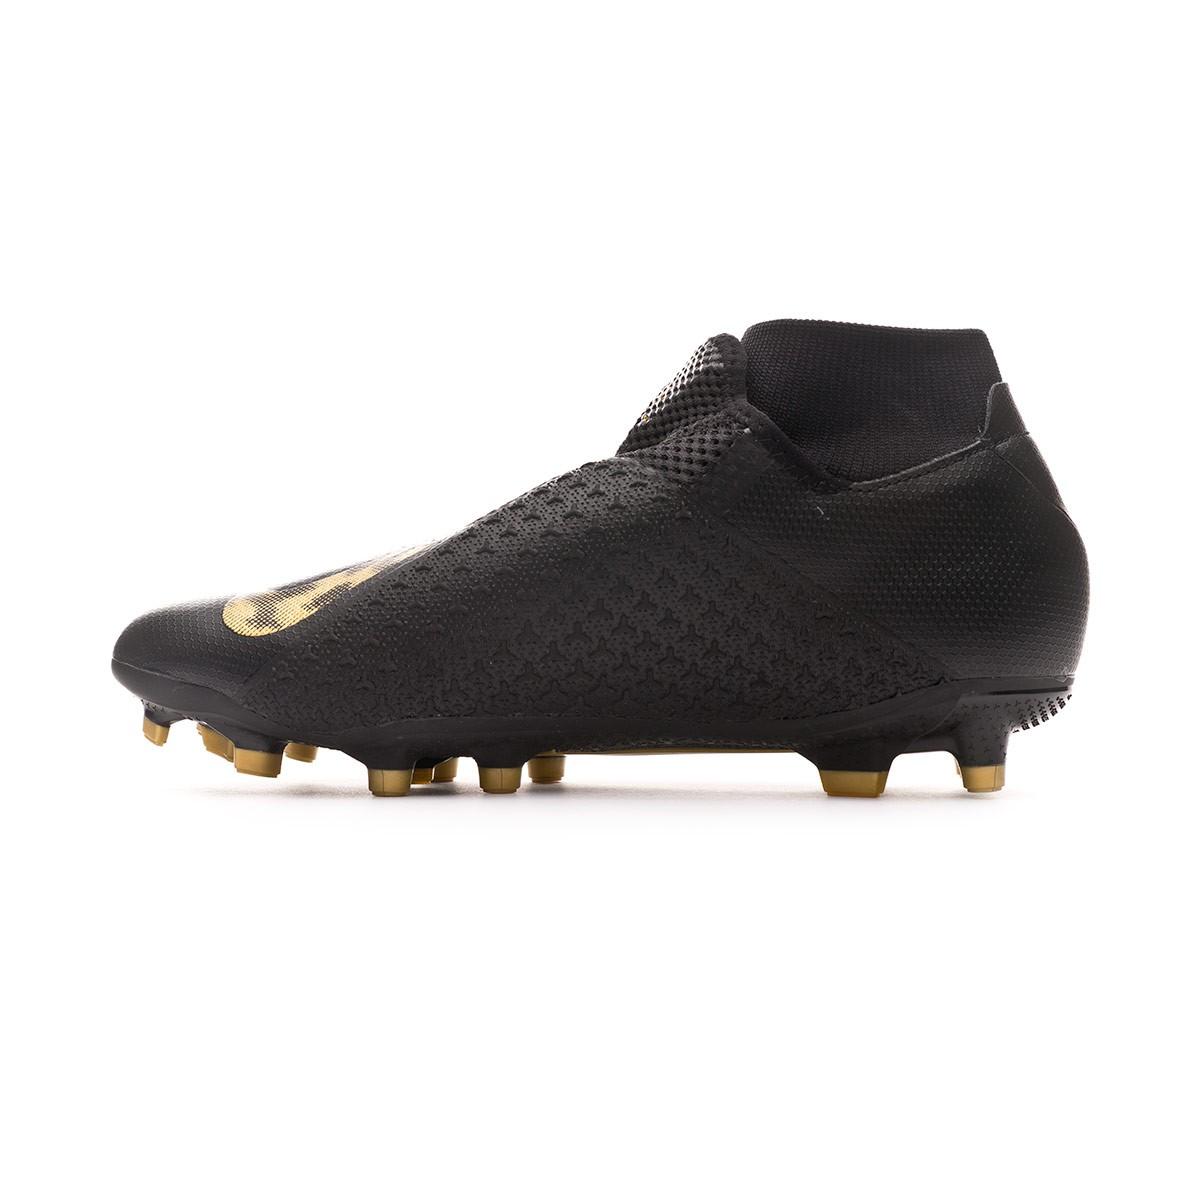 bfc35608561 Zapatos de fútbol Nike Phantom Vision Academy DF FG/MG Black-Metallic vivid  gold - Tienda de fútbol Fútbol Emotion